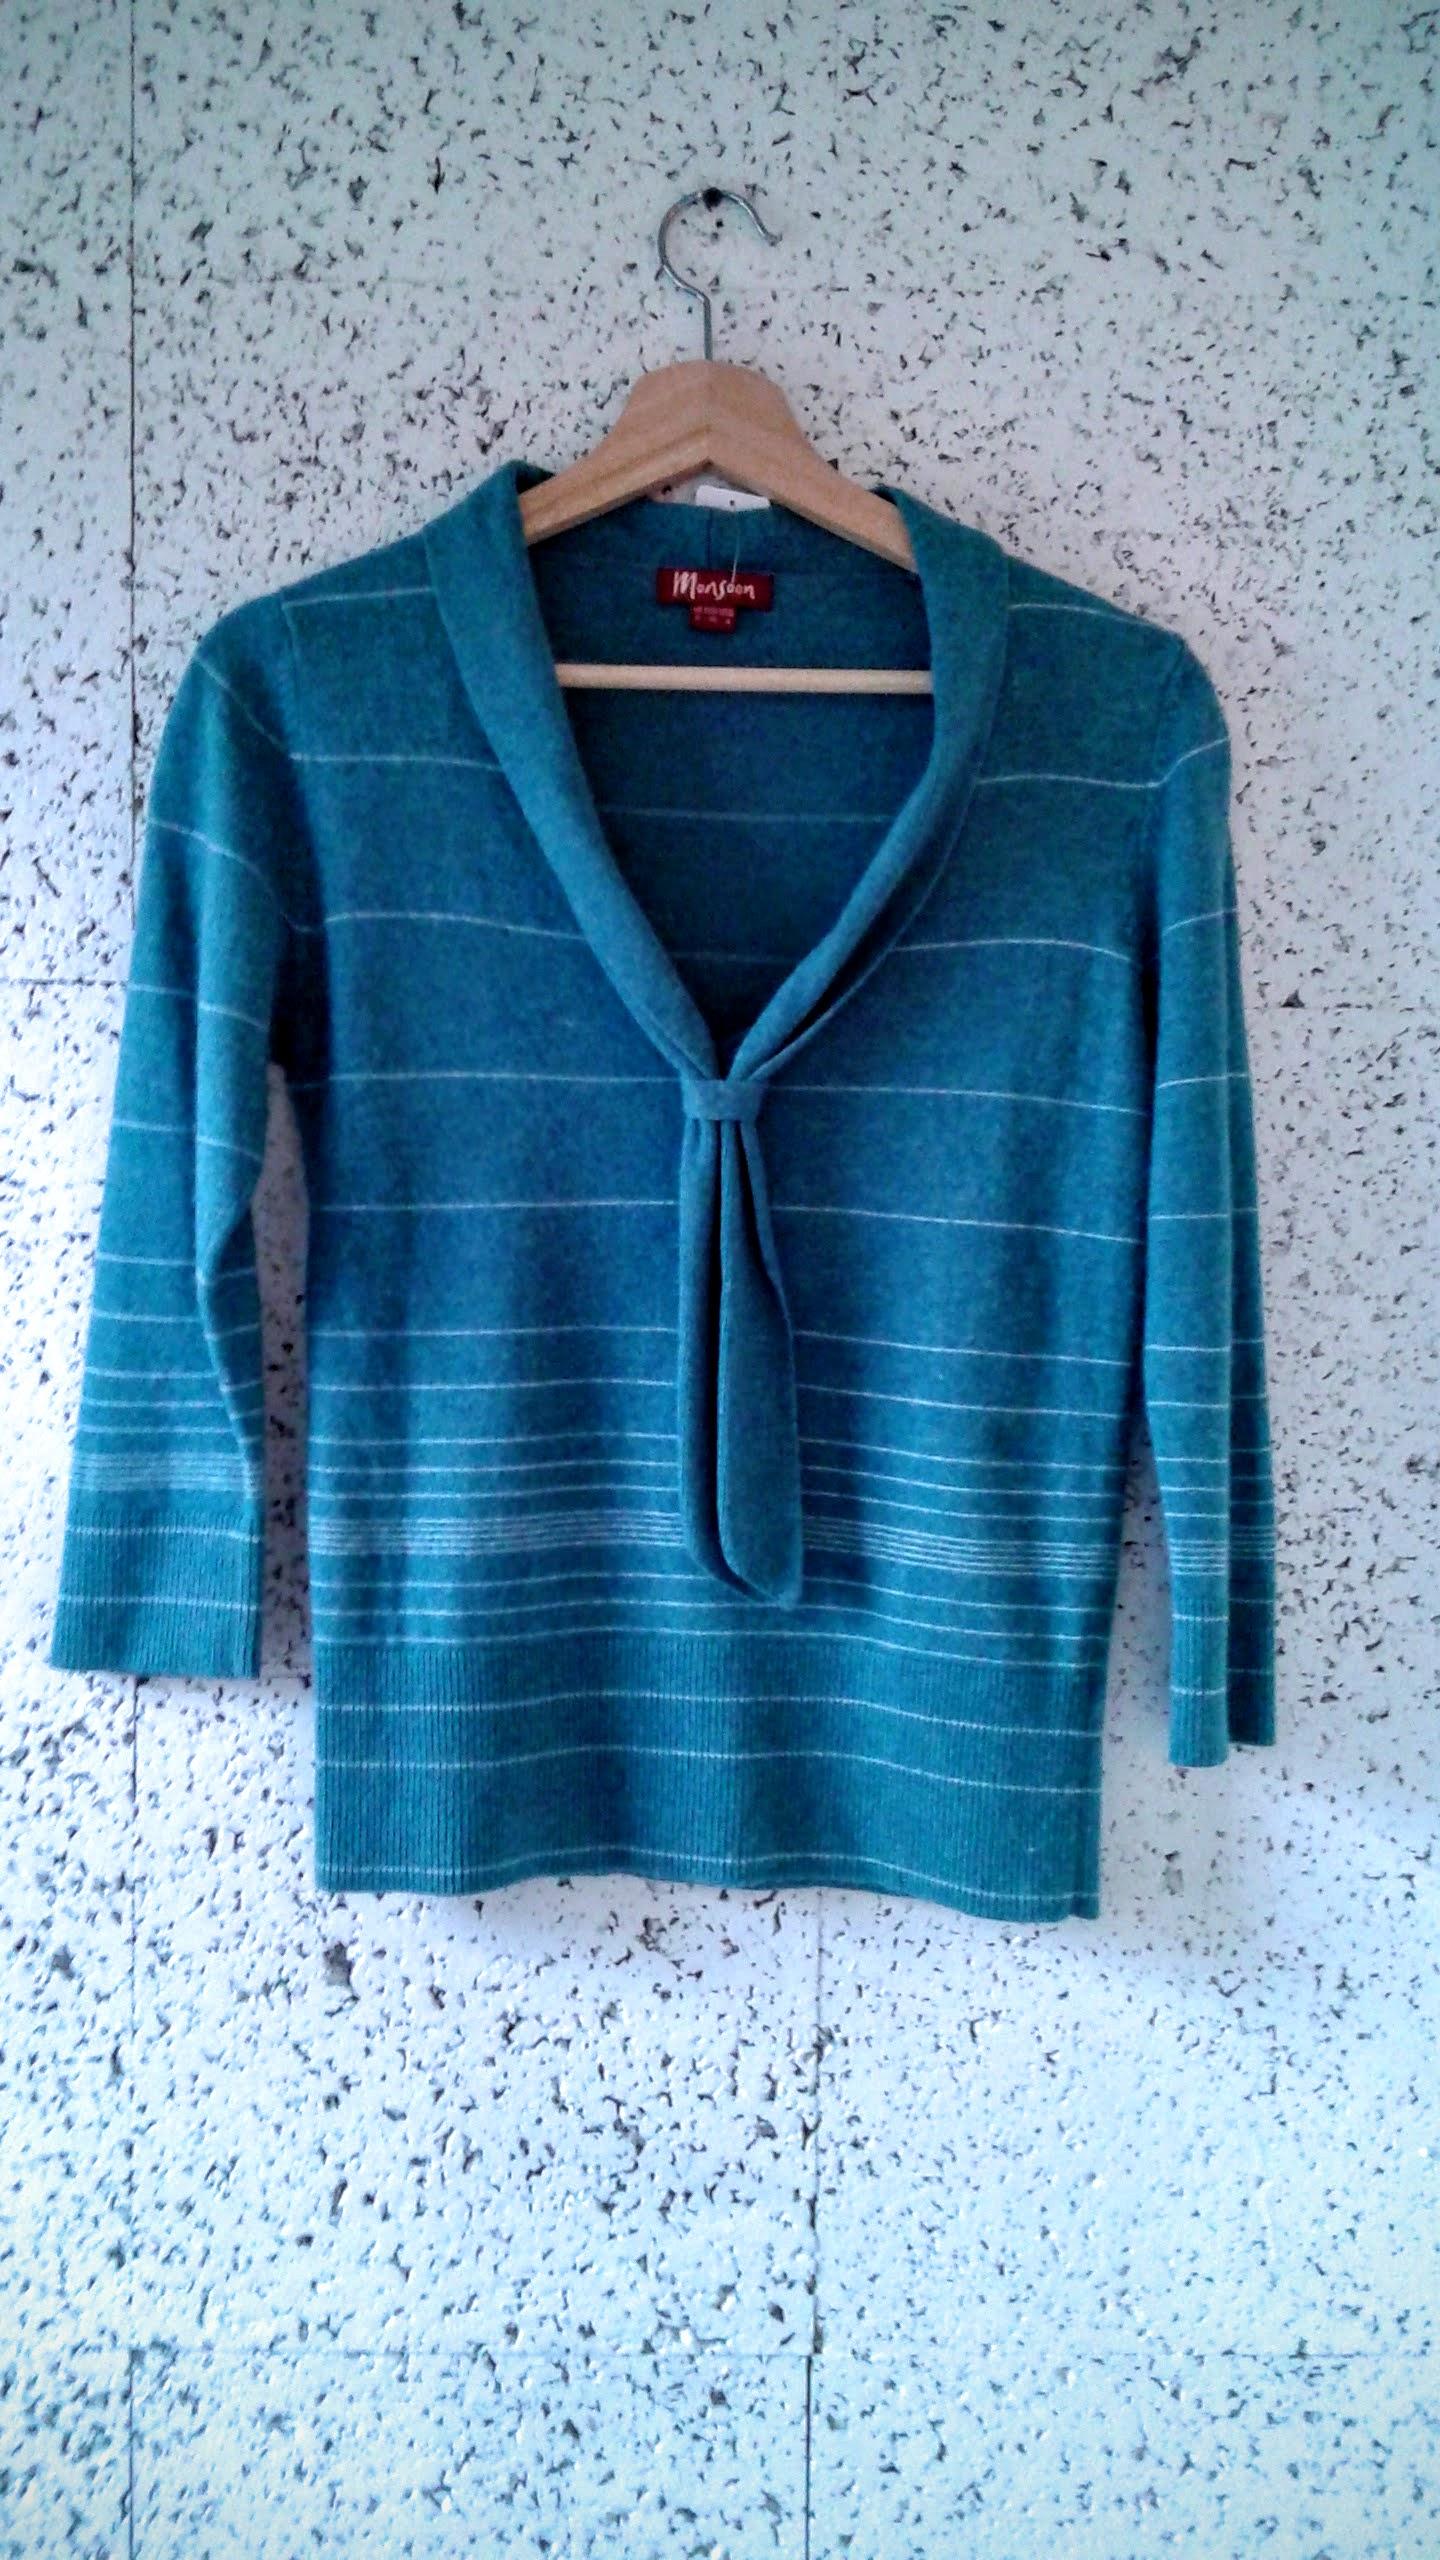 Monsoon  sweater; Size S, $26